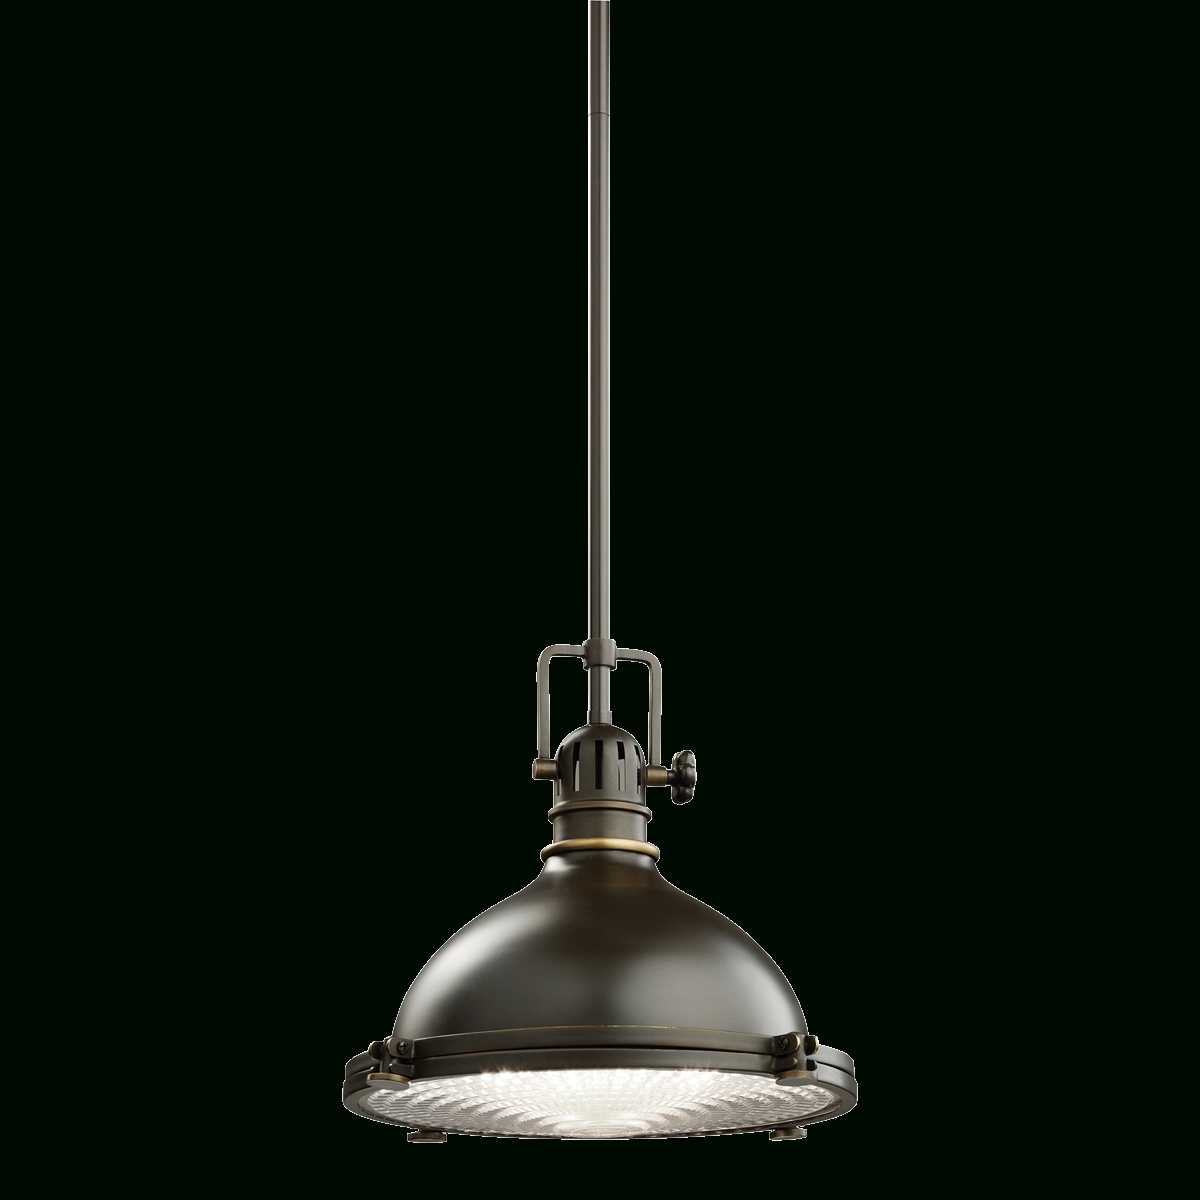 Kichler 1 Light Industrial Pendant (2665pn)| Polished Nickel Lighting Intended For Kichler Pendant Lights Fixtures (View 14 of 15)